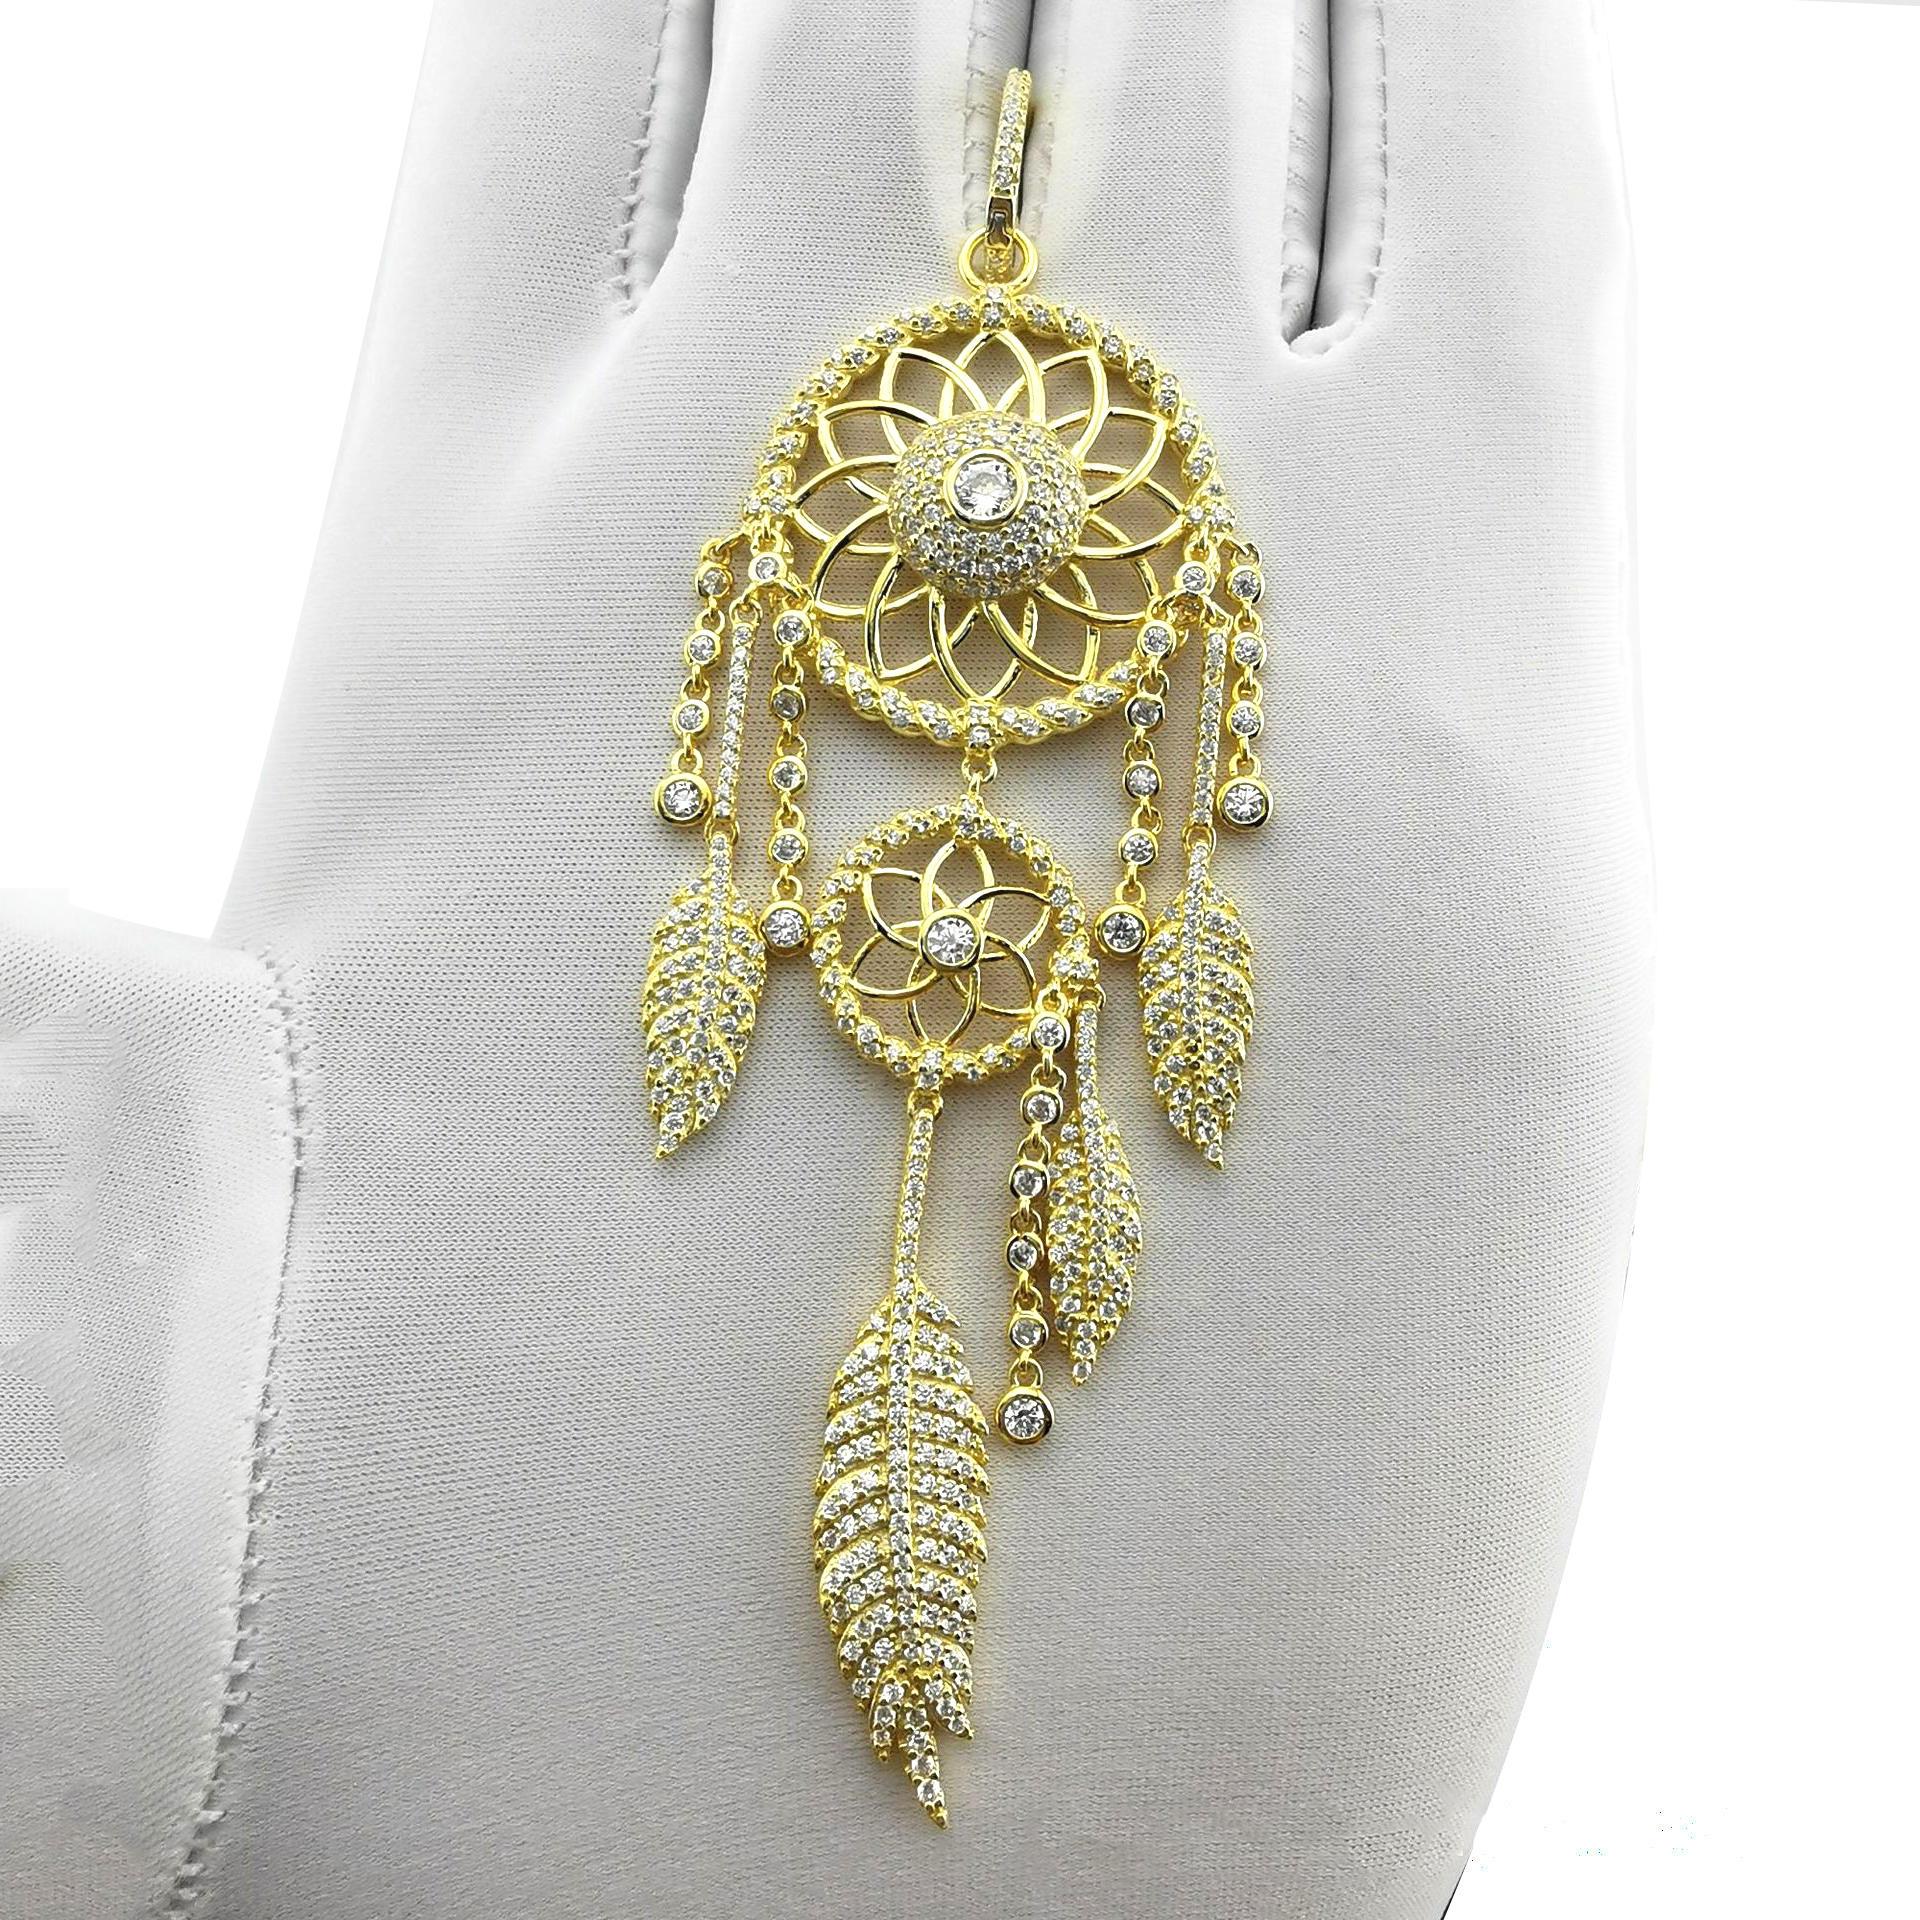 Brilliant Cz Feather New Design Gold Jhumka Earrings Saudi Gold Jewelry Hot Sale